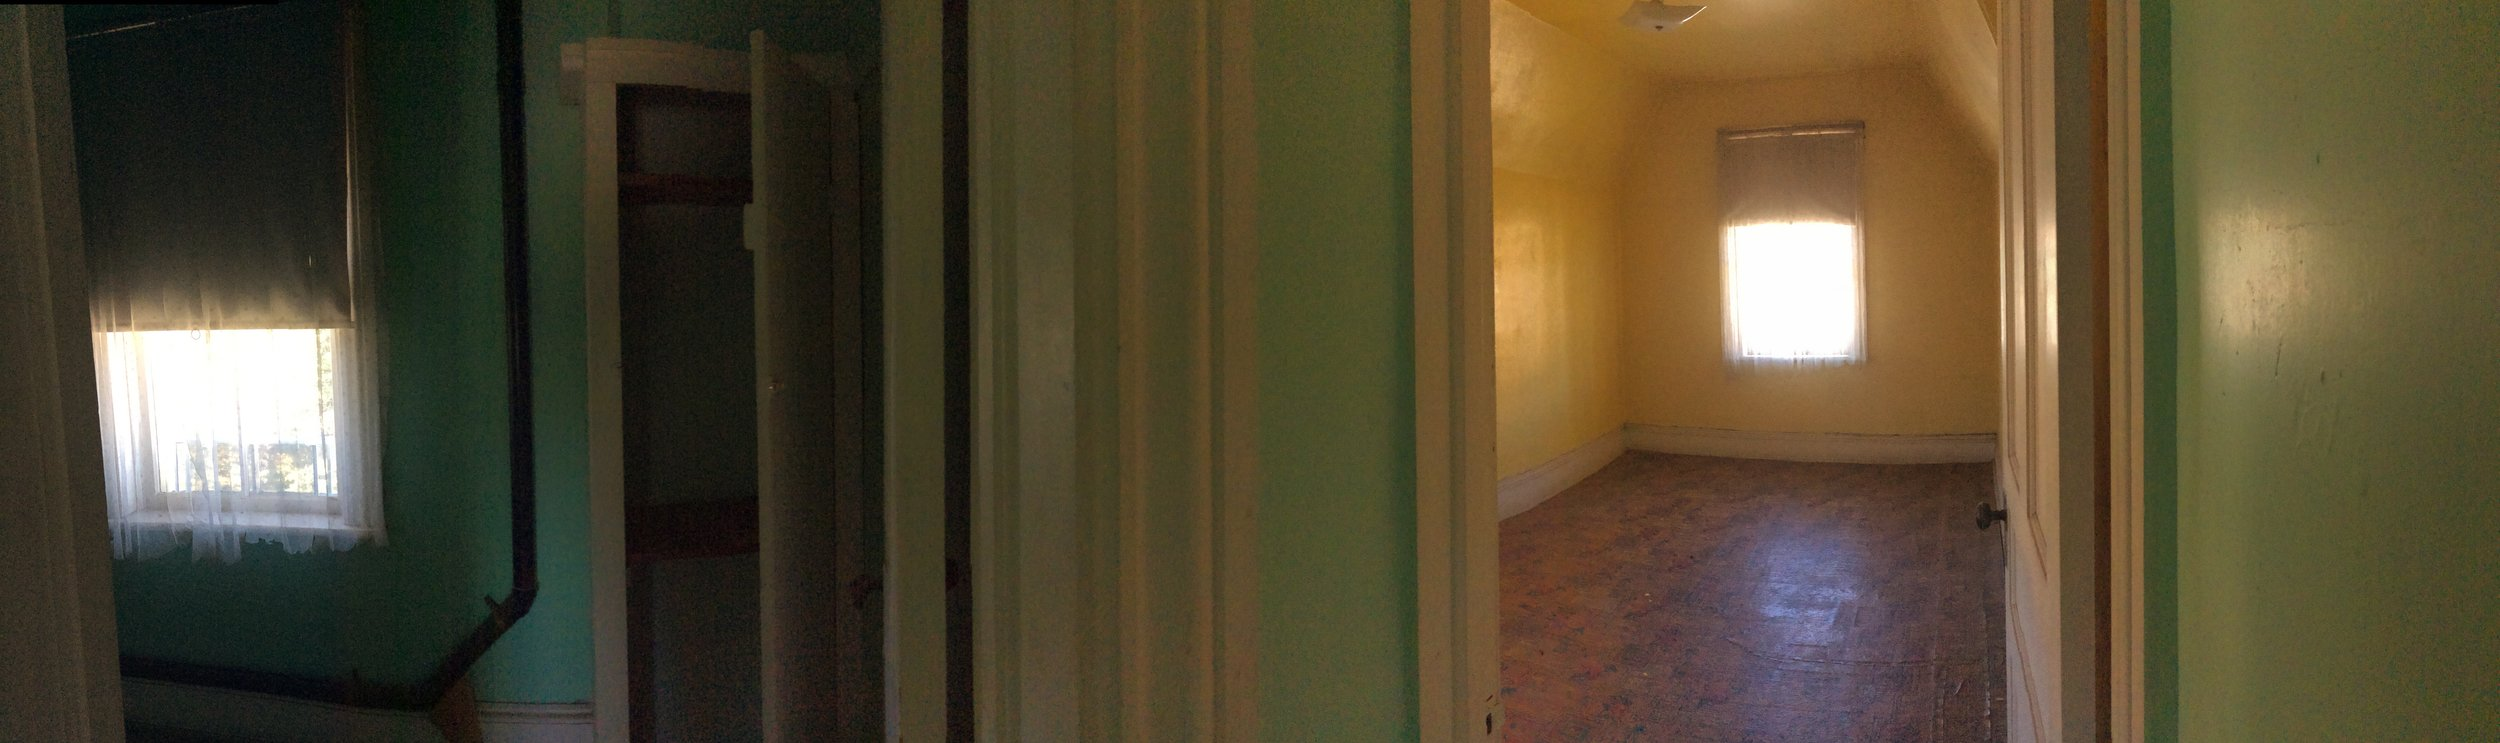 Hallway and Bedroom 3